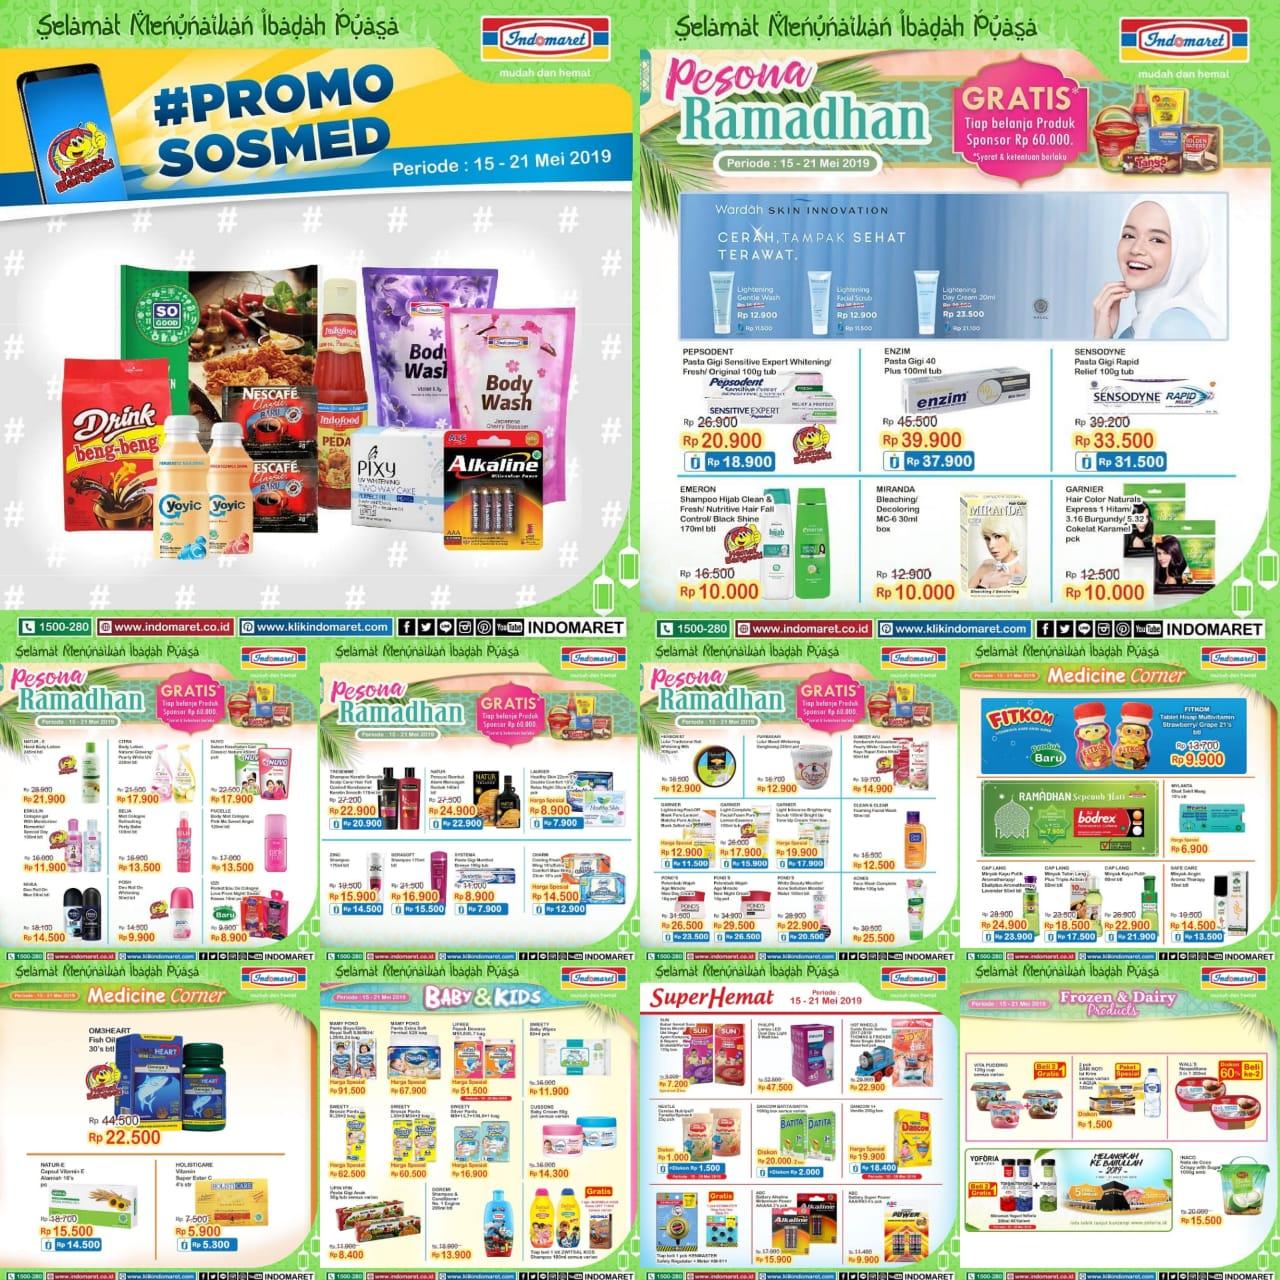 Katalog Promo Hemat Ramadhan Indomaret Periode 15-21 Mei 2019